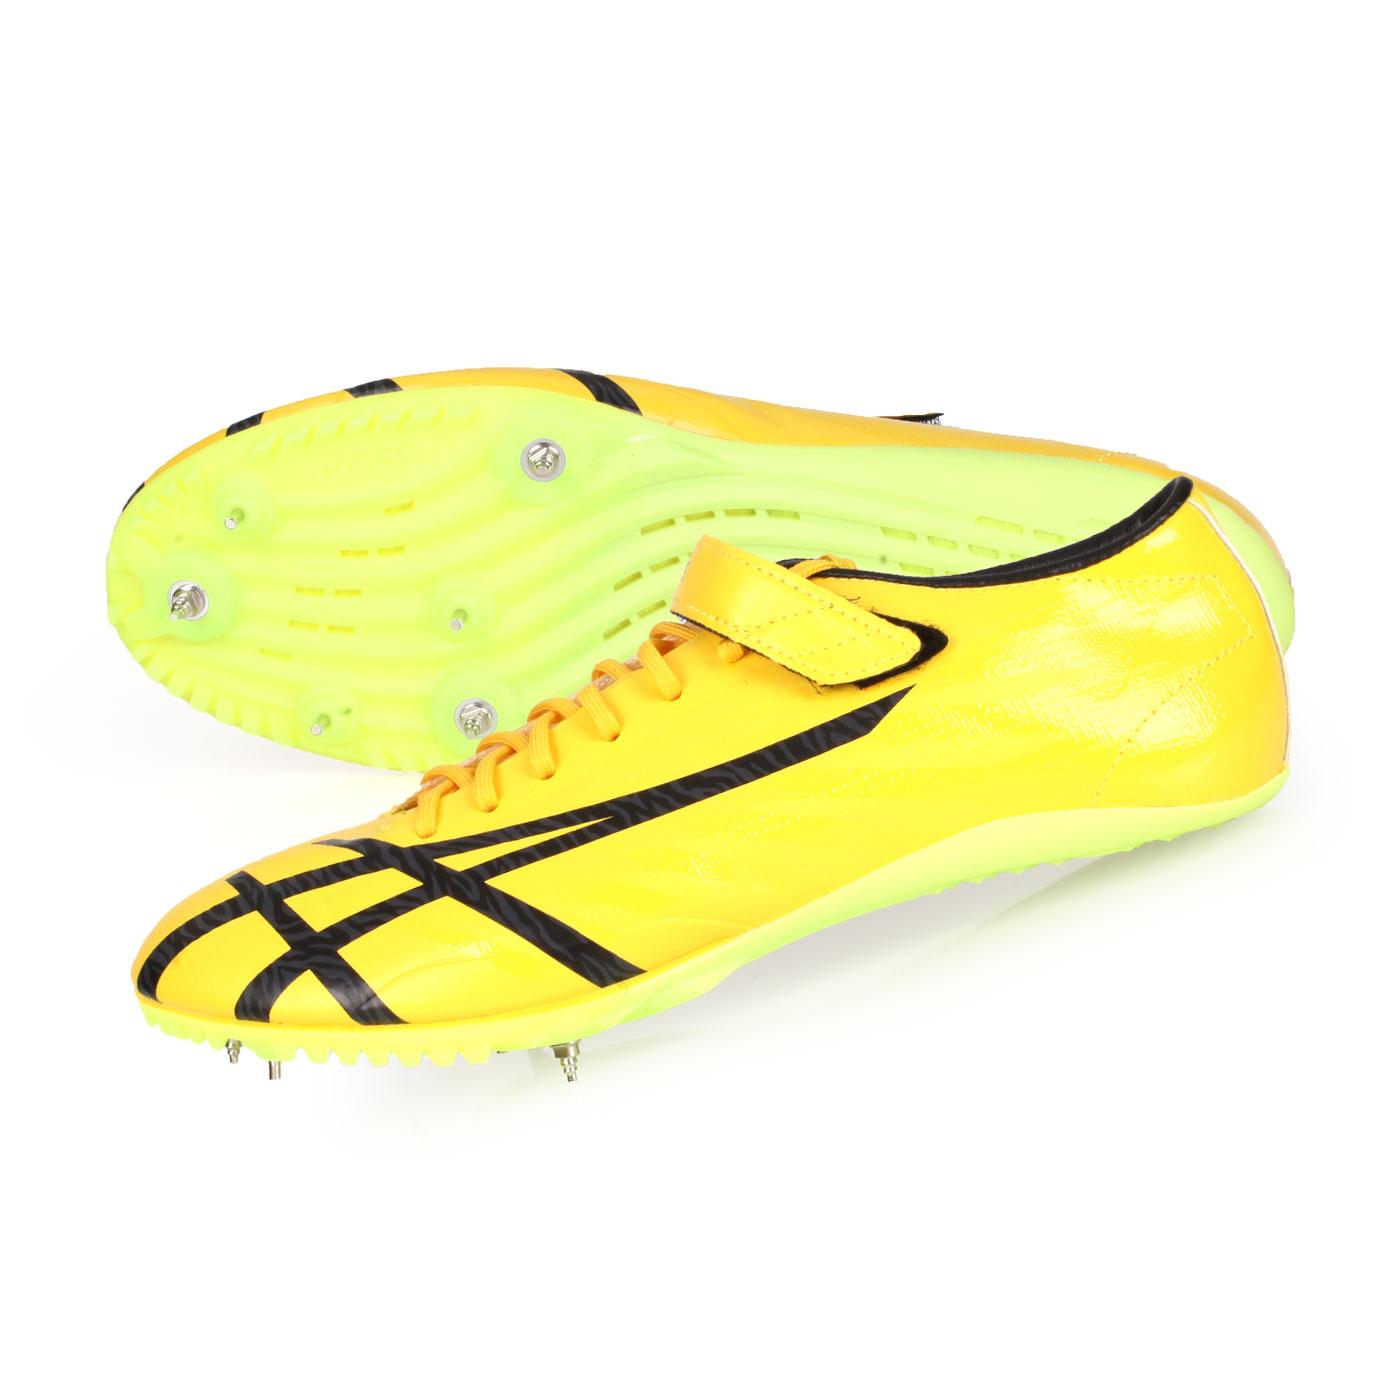 ASICS 田徑釘鞋(短距離)  @JETSPRINT@TTP527-750